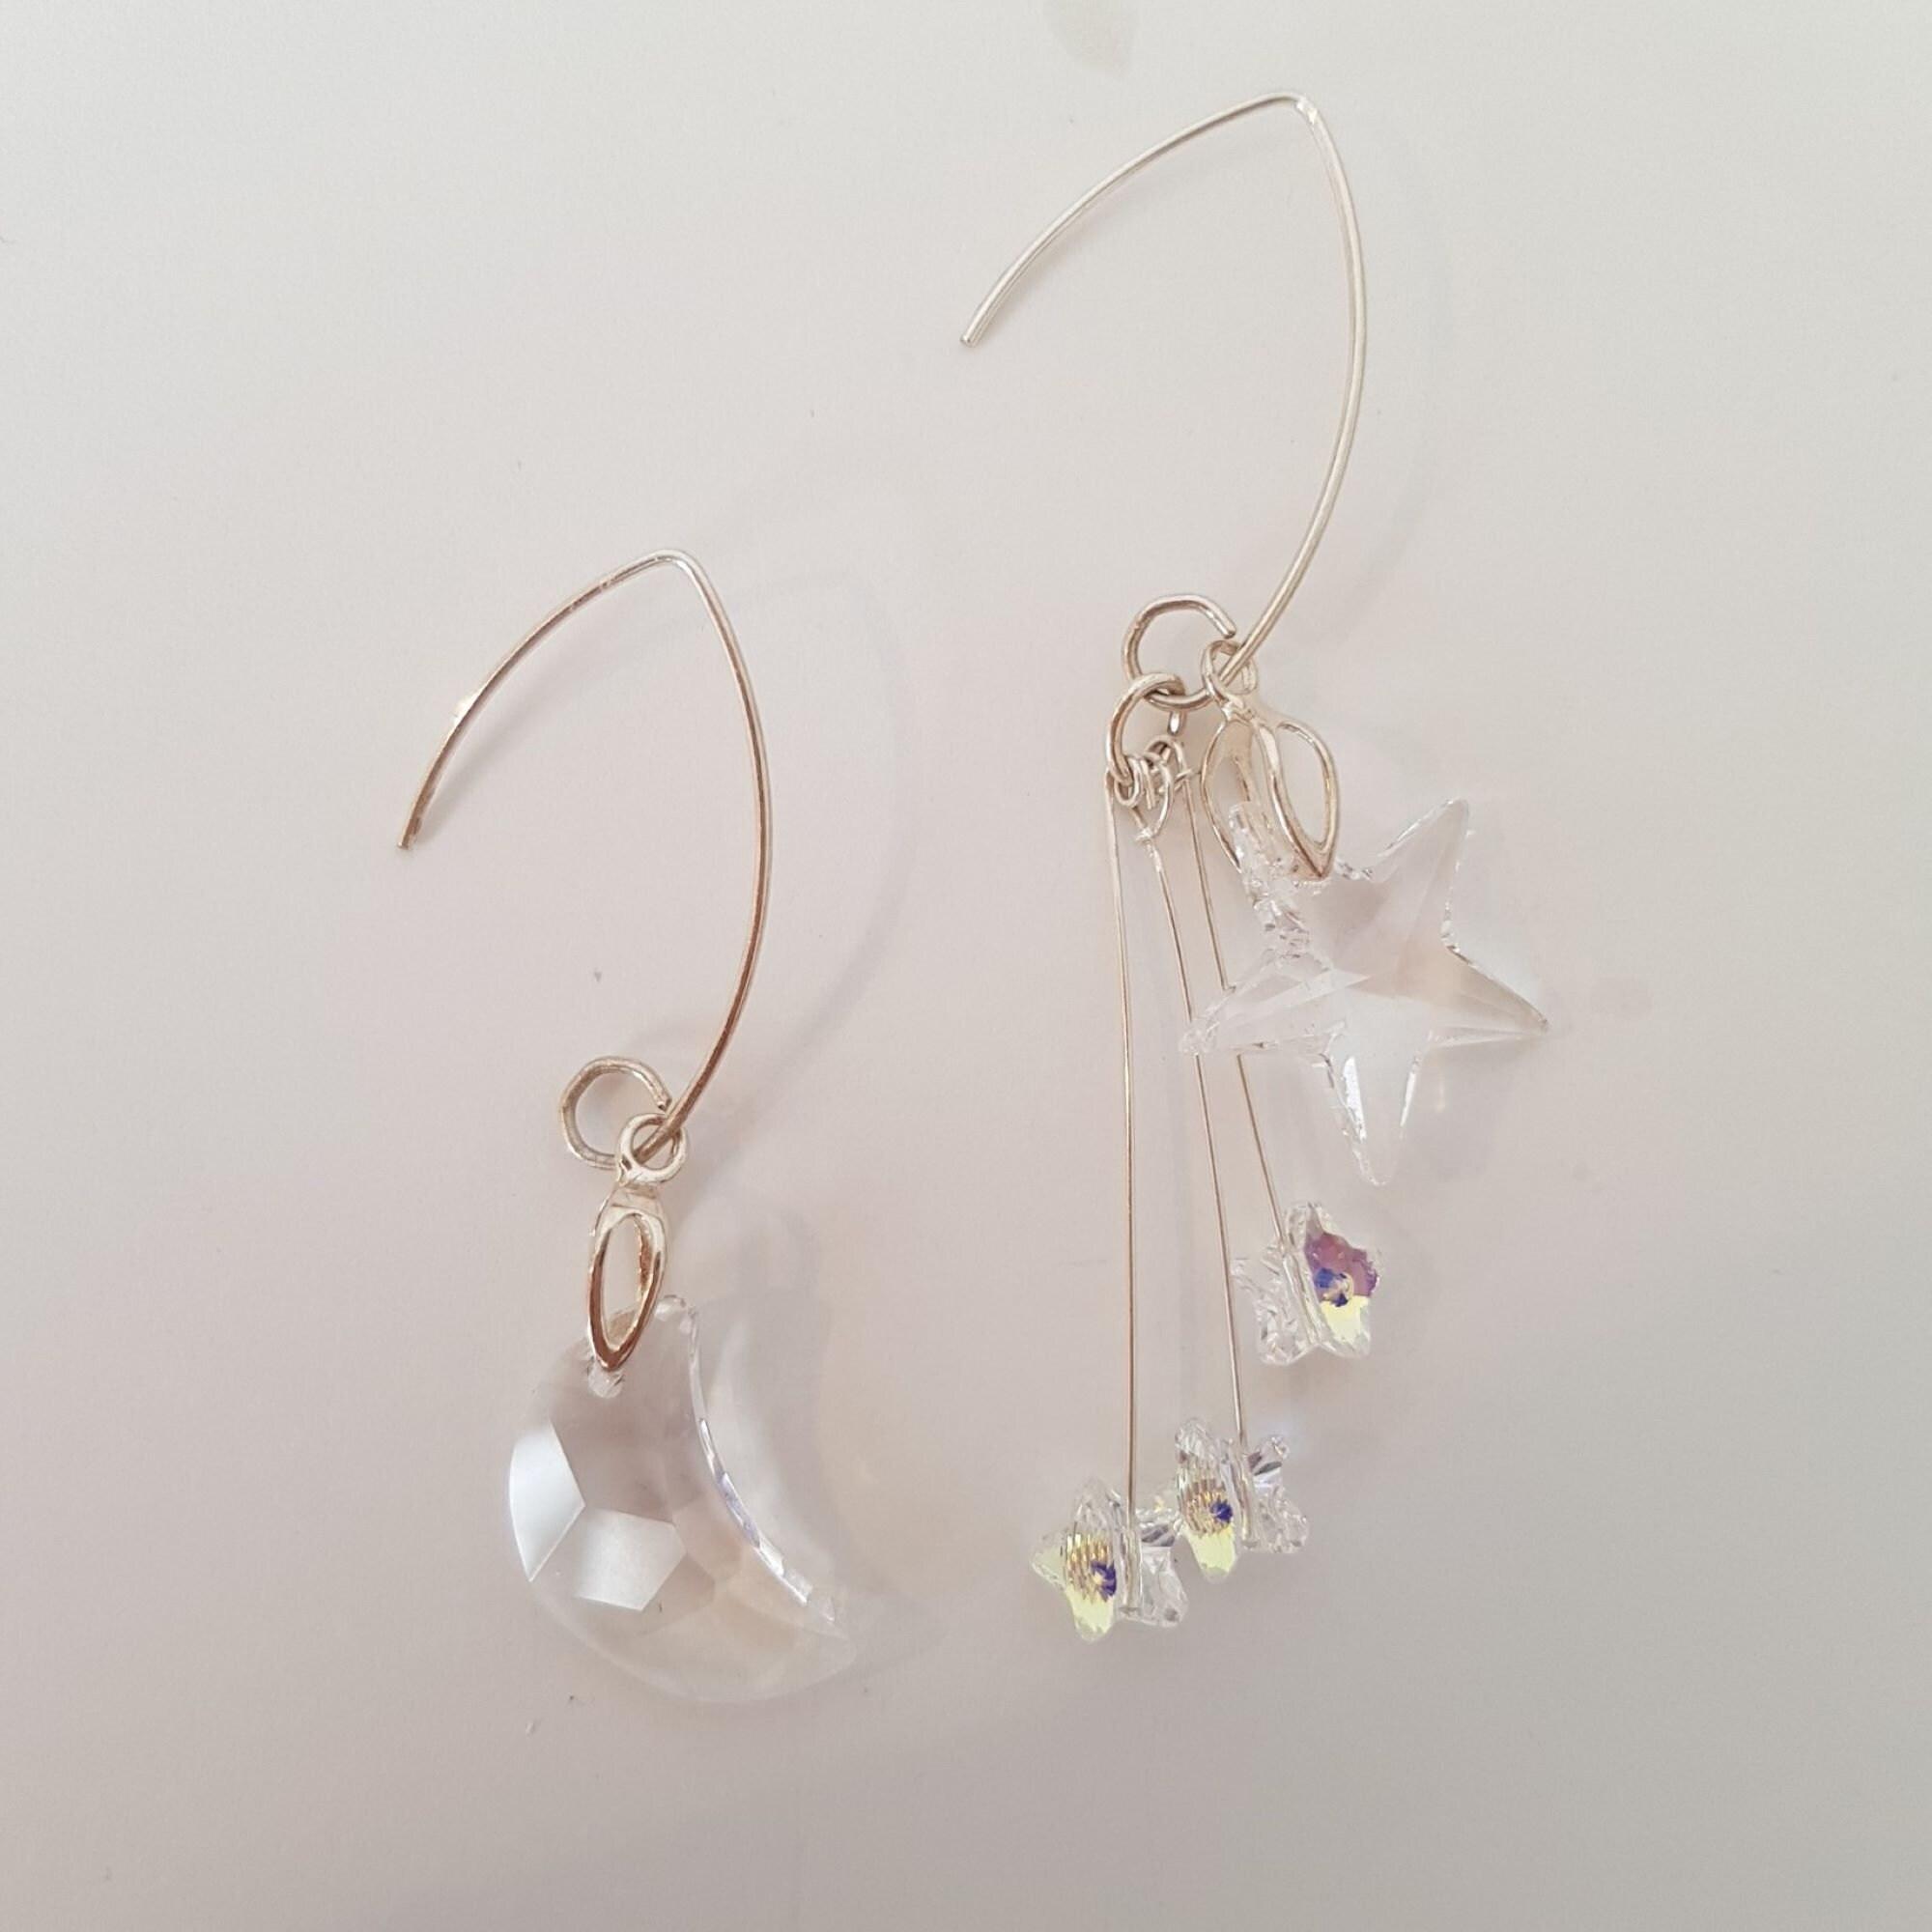 earrings, moon earrings, star earrings, sparkly, christmas